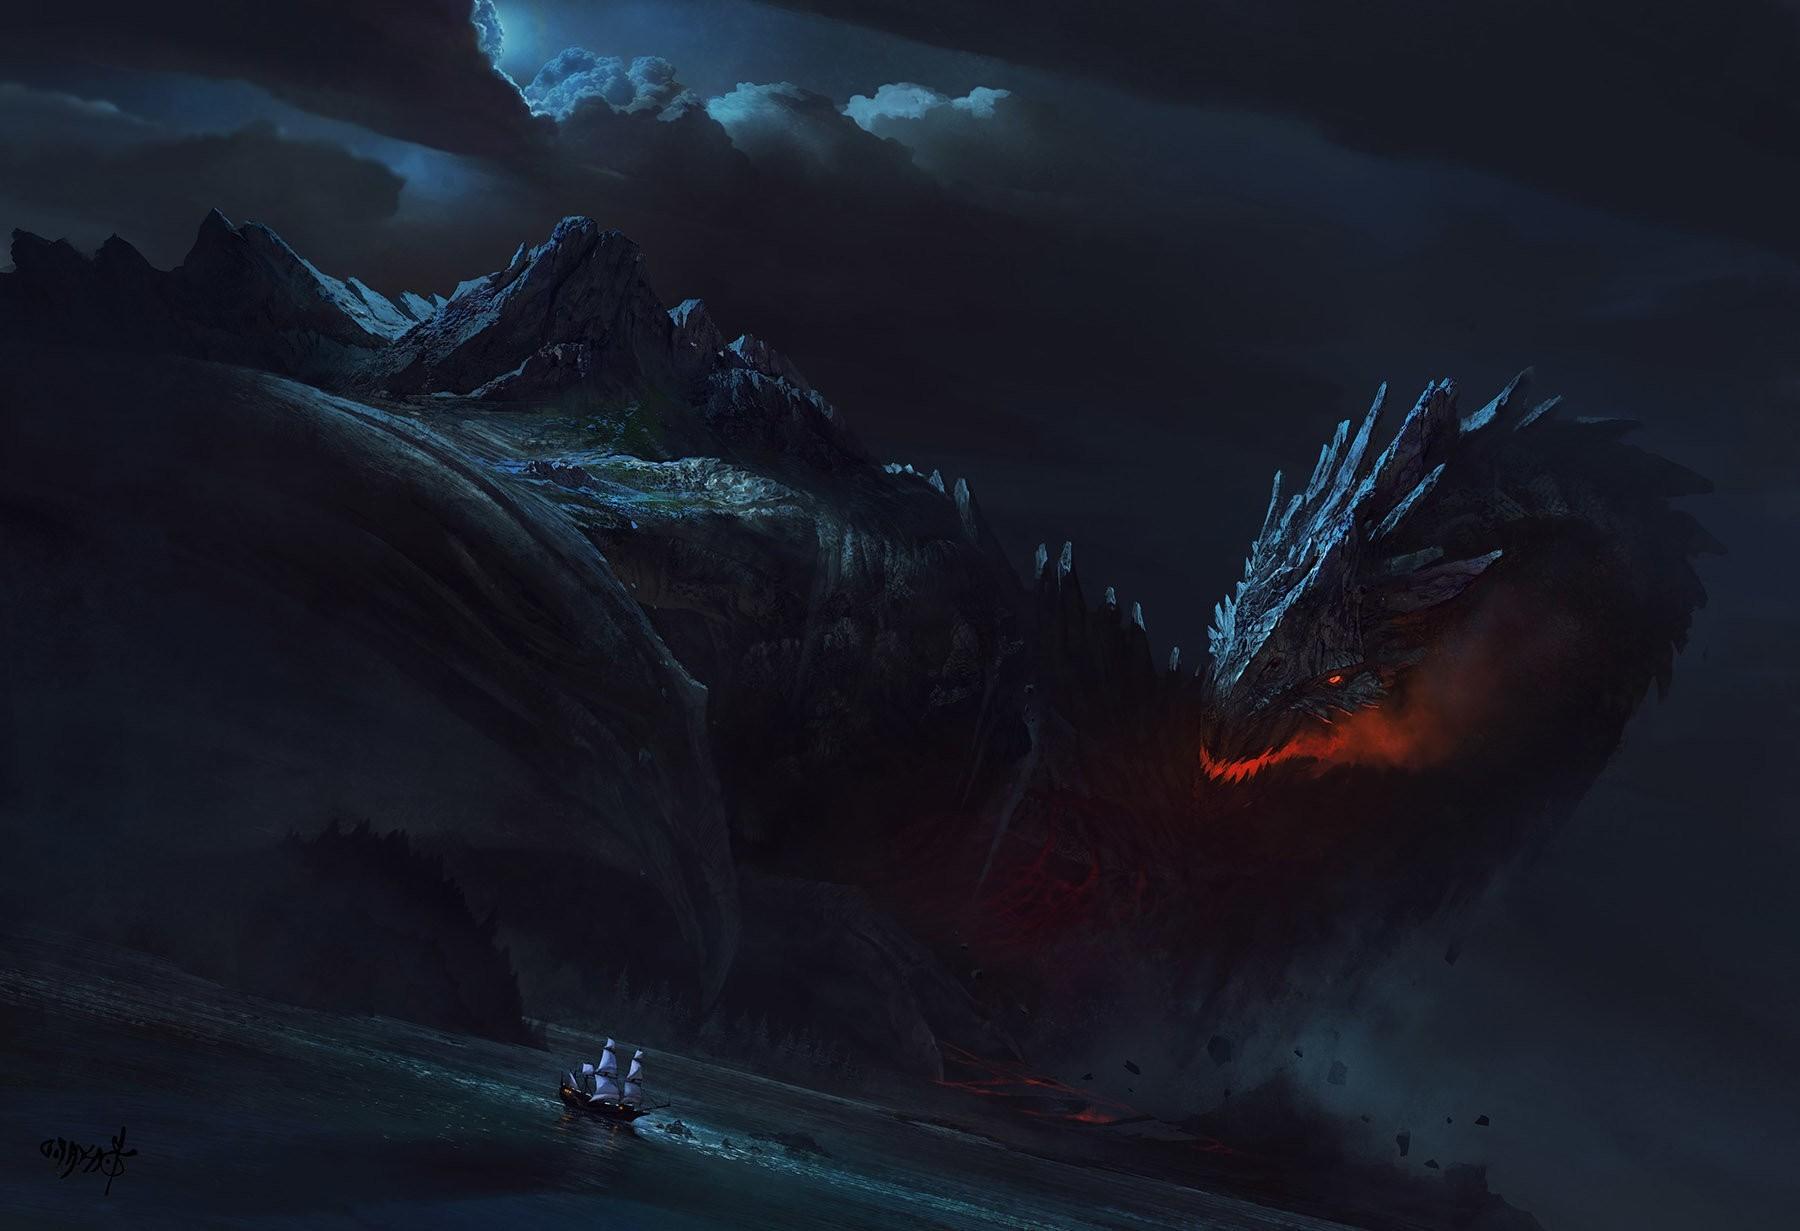 Best Wallpaper Night Dragon - ship-fantasy-art-night-dragon-ghost-ship-Terrain-wave-darkness-screenshot-computer-wallpaper-geological-phenomenon-1800x1231-px-611456  HD.jpg